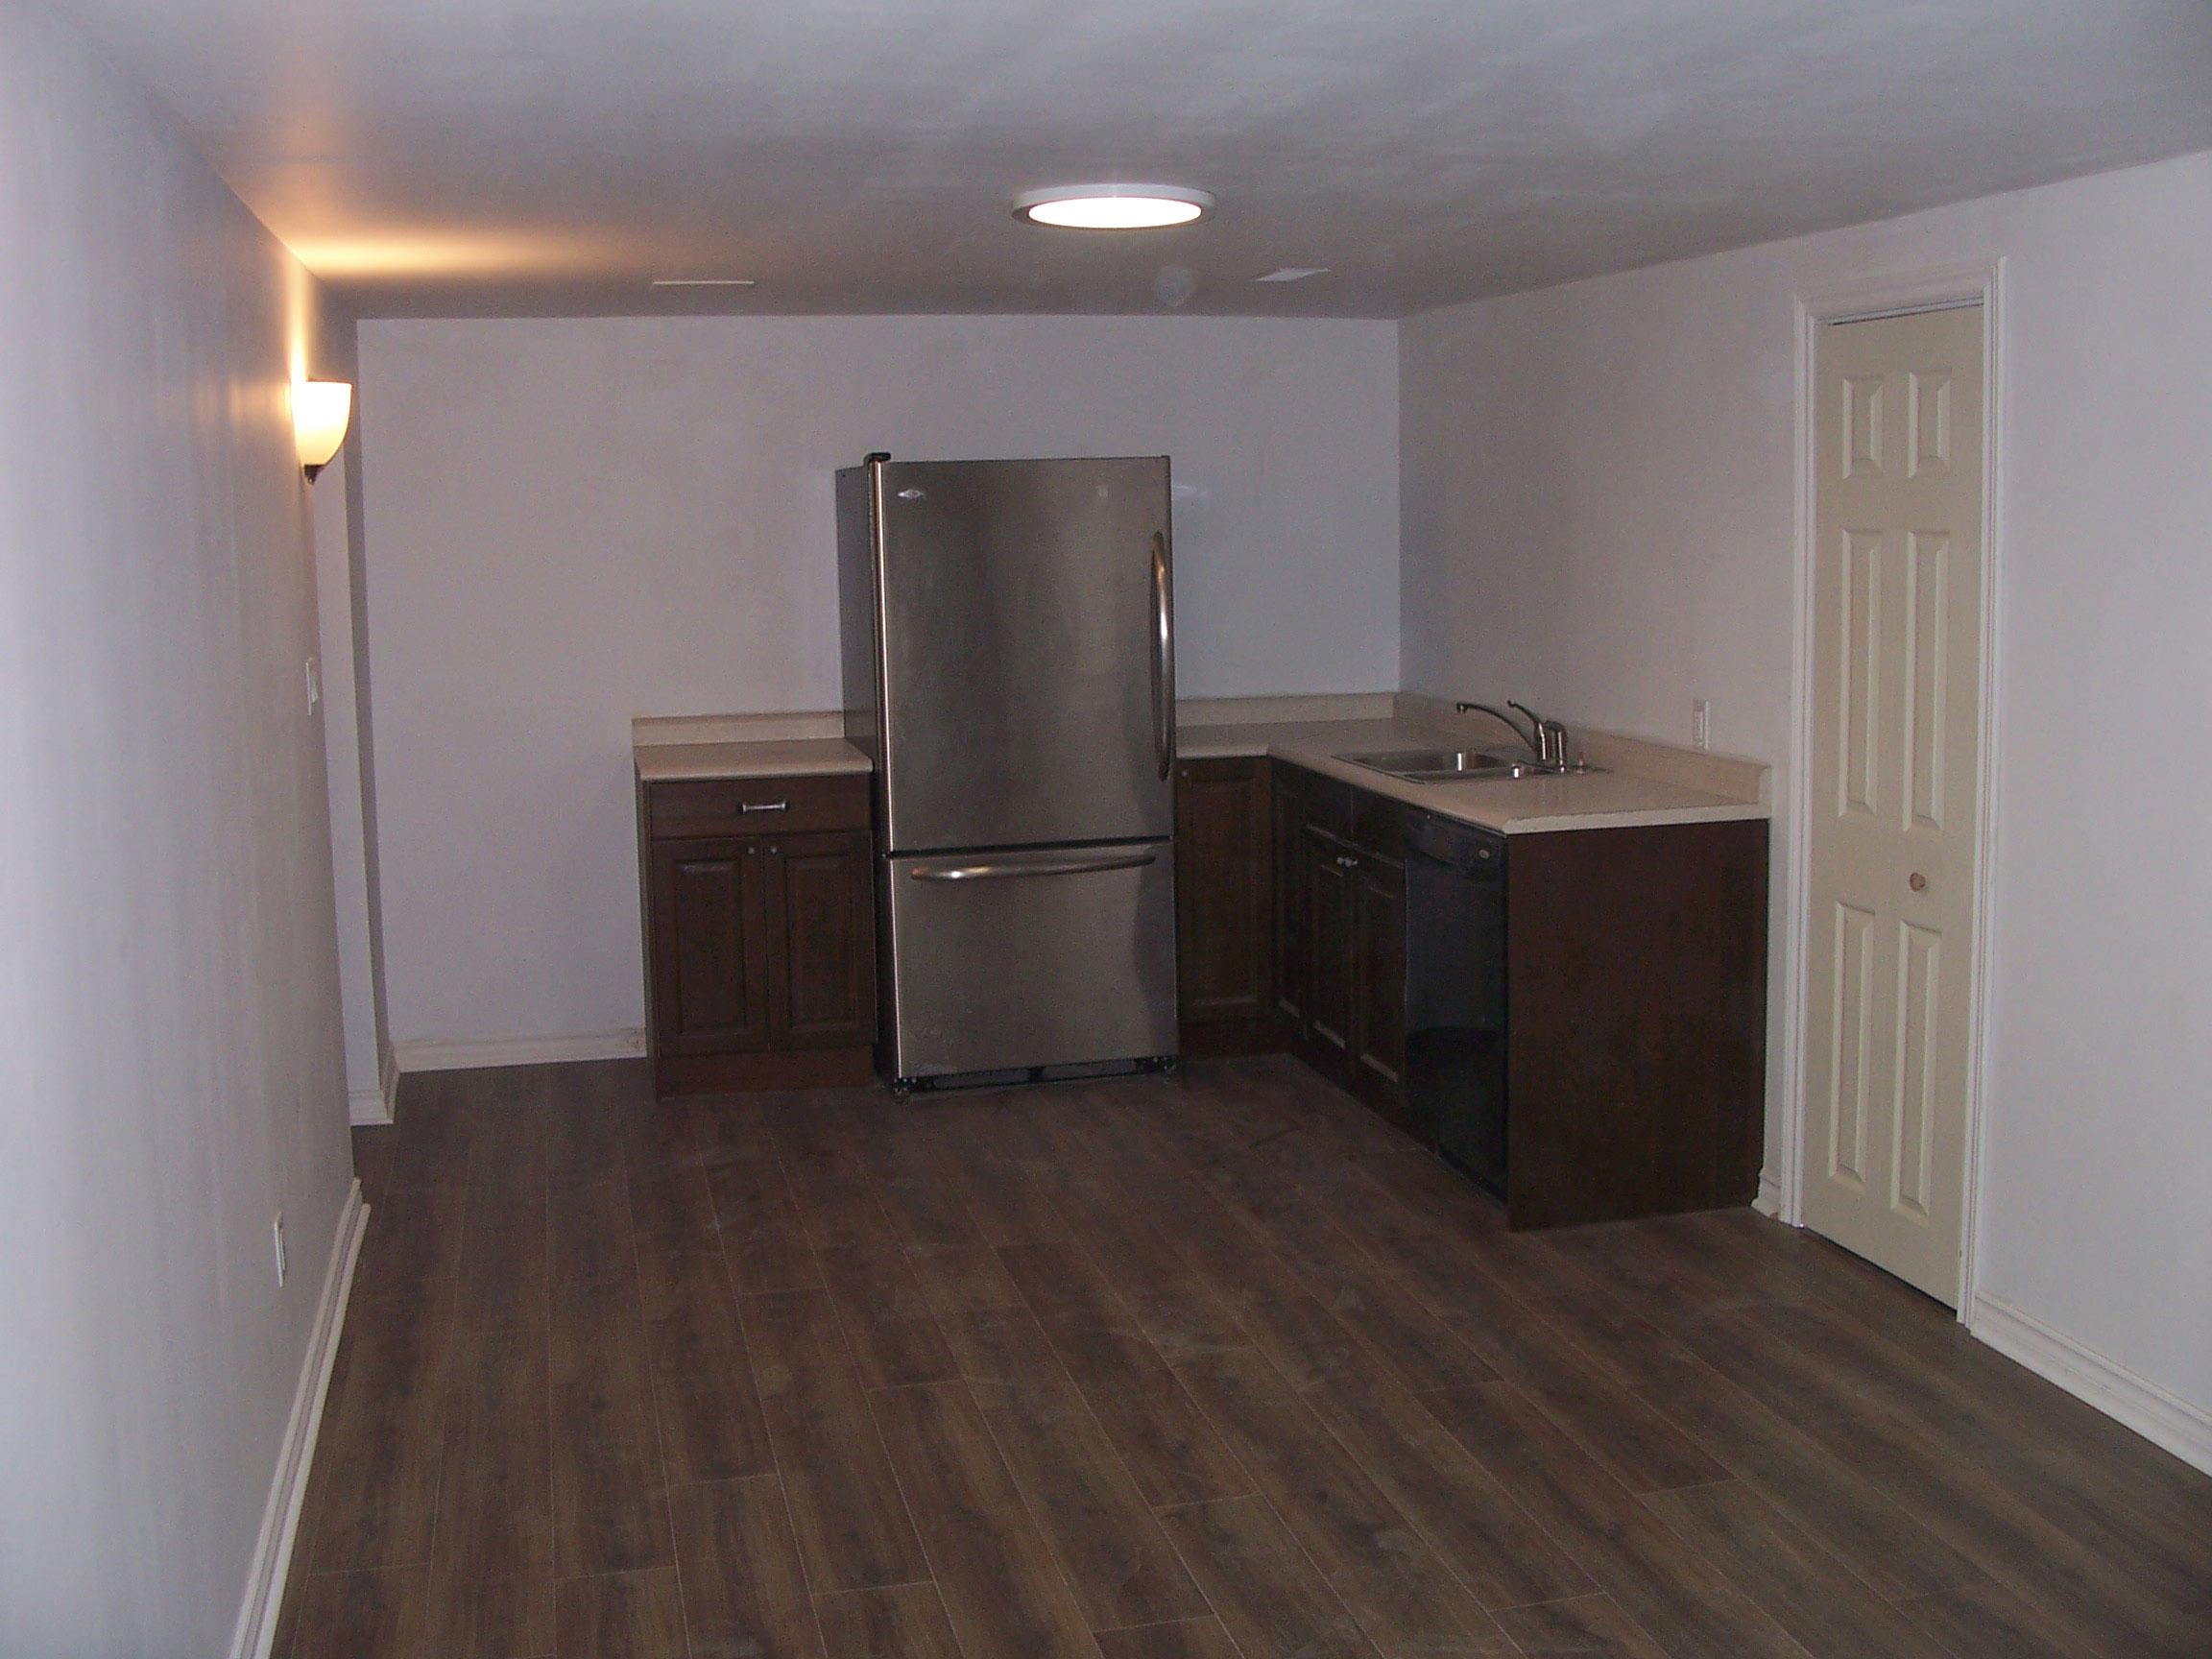 Basement Kitchen After